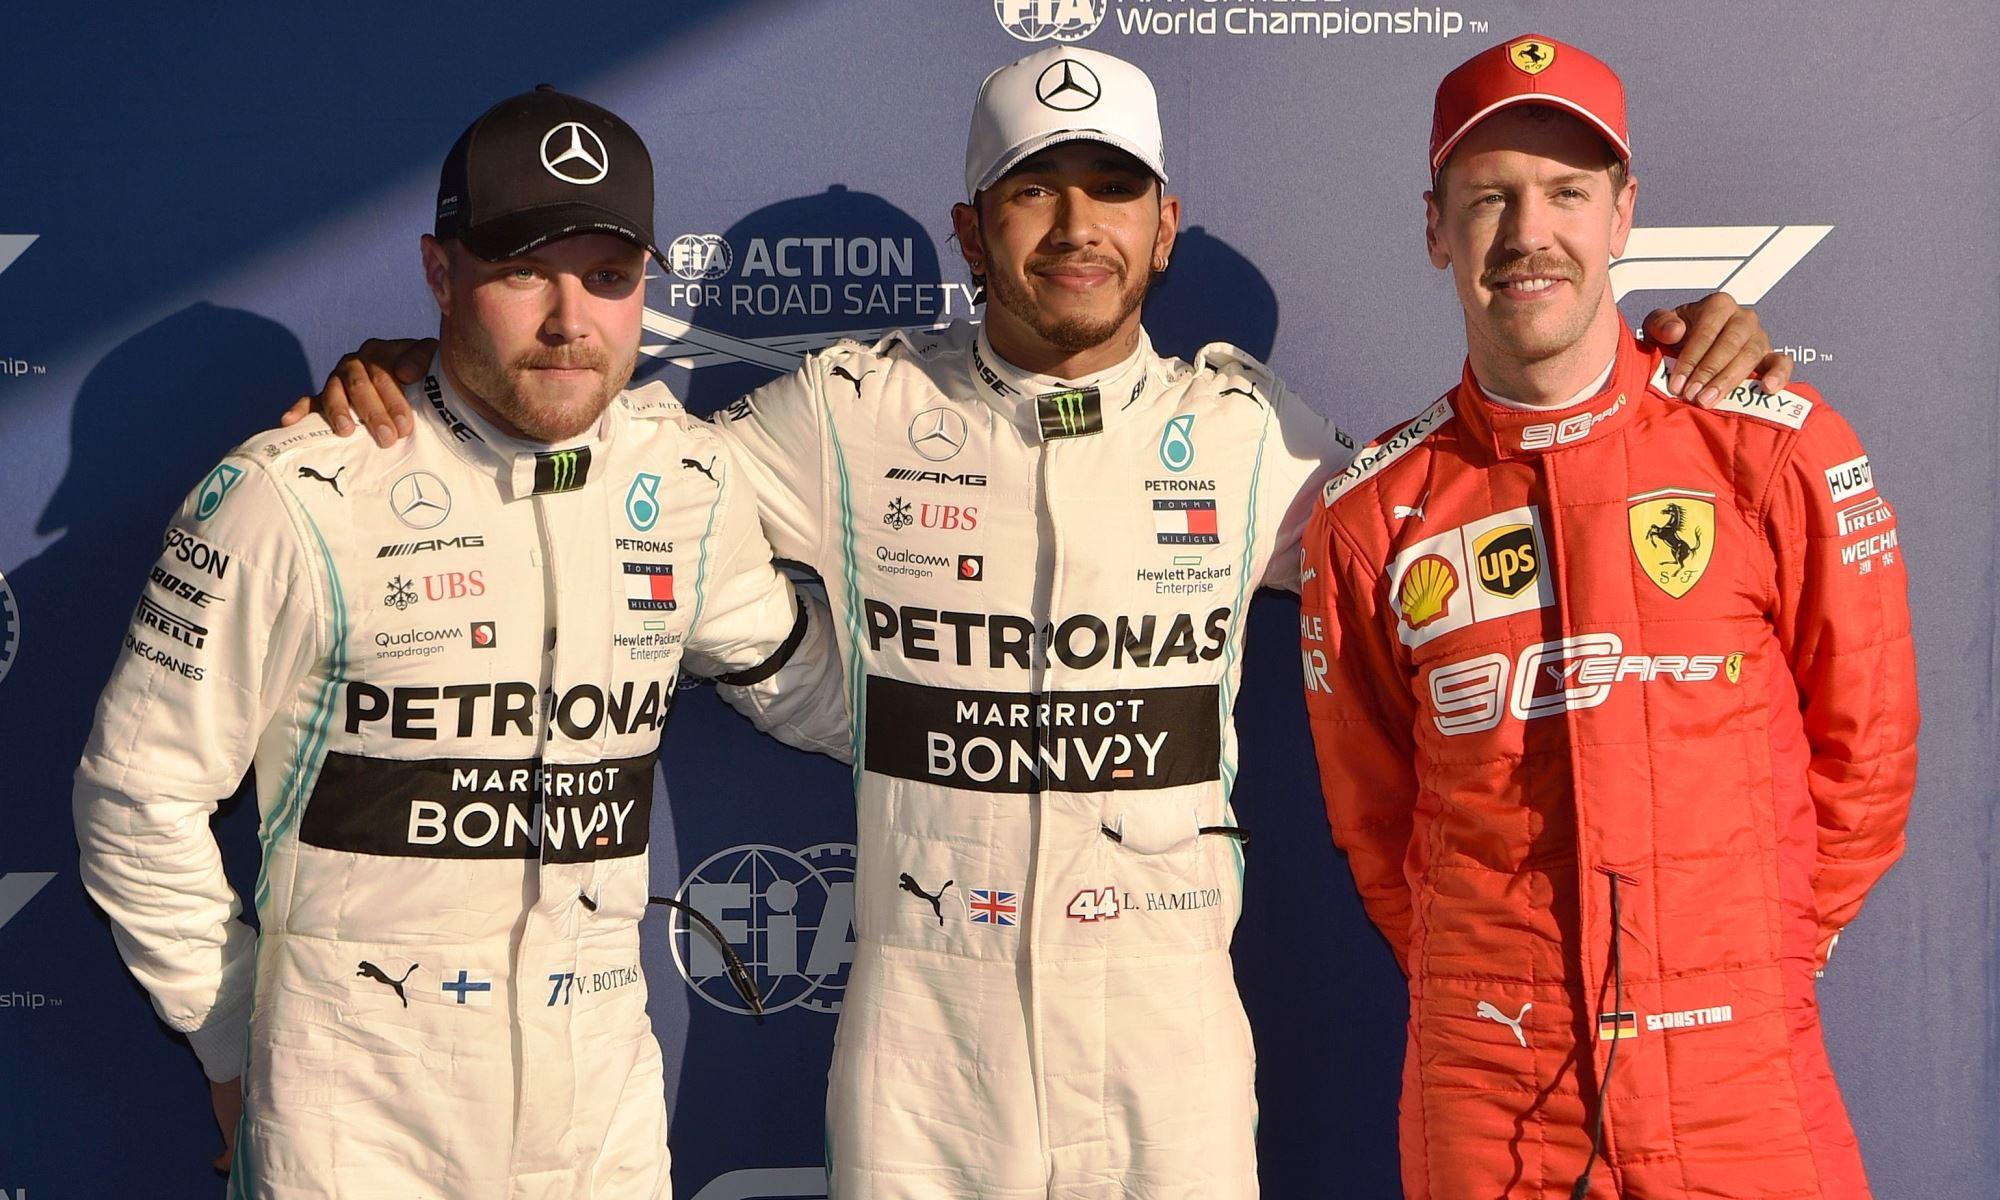 Bottas, Hamilton and Vettel